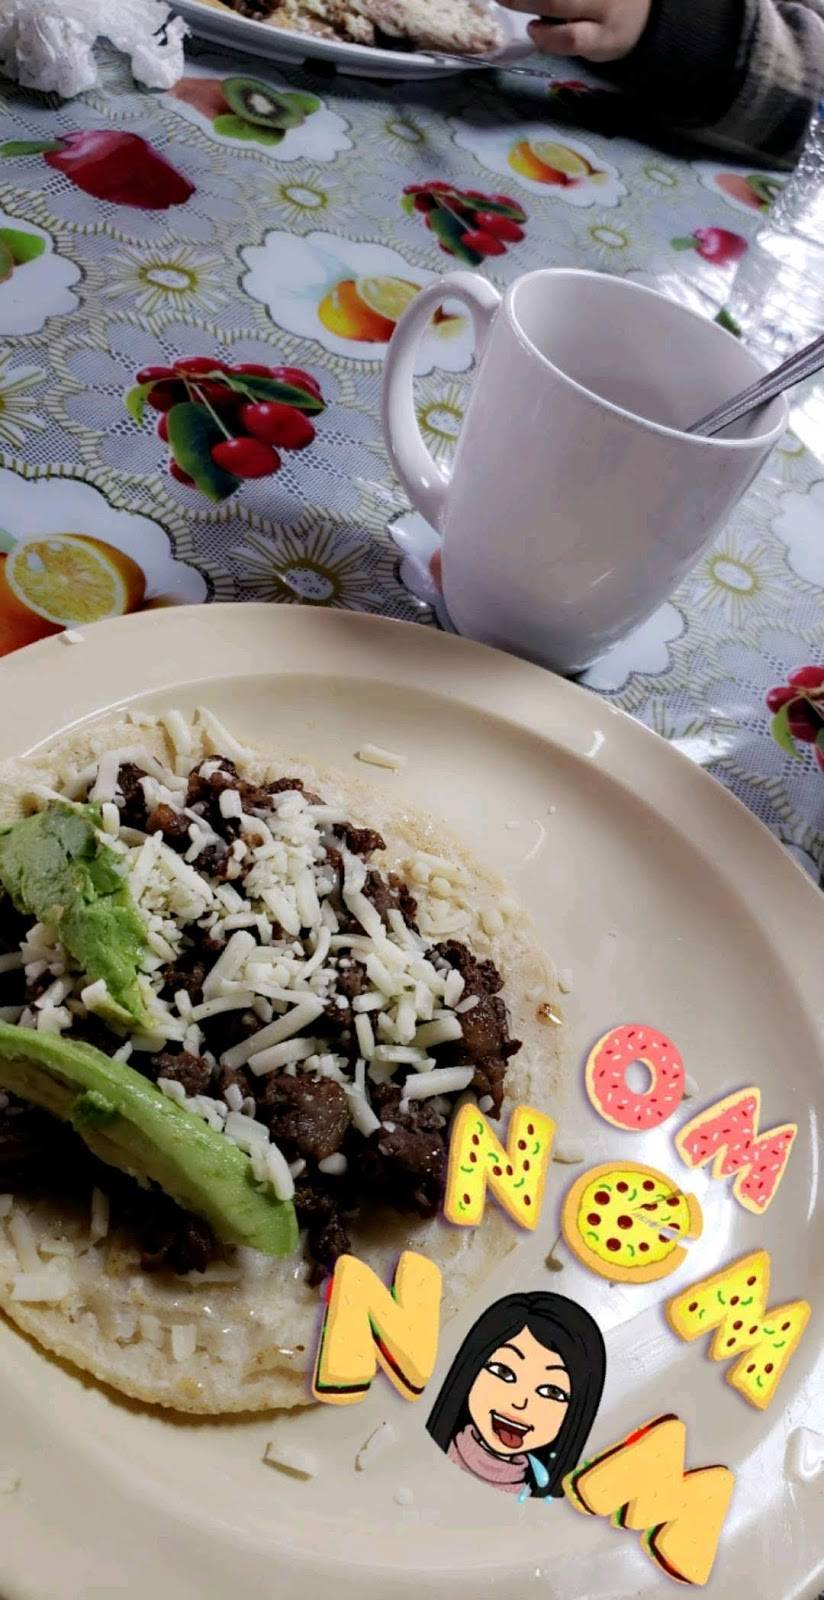 El Padrino Pleasant Grove | restaurant | 1215 S Buckner Blvd, Dallas, TX 75217, USA | 2143912492 OR +1 214-391-2492